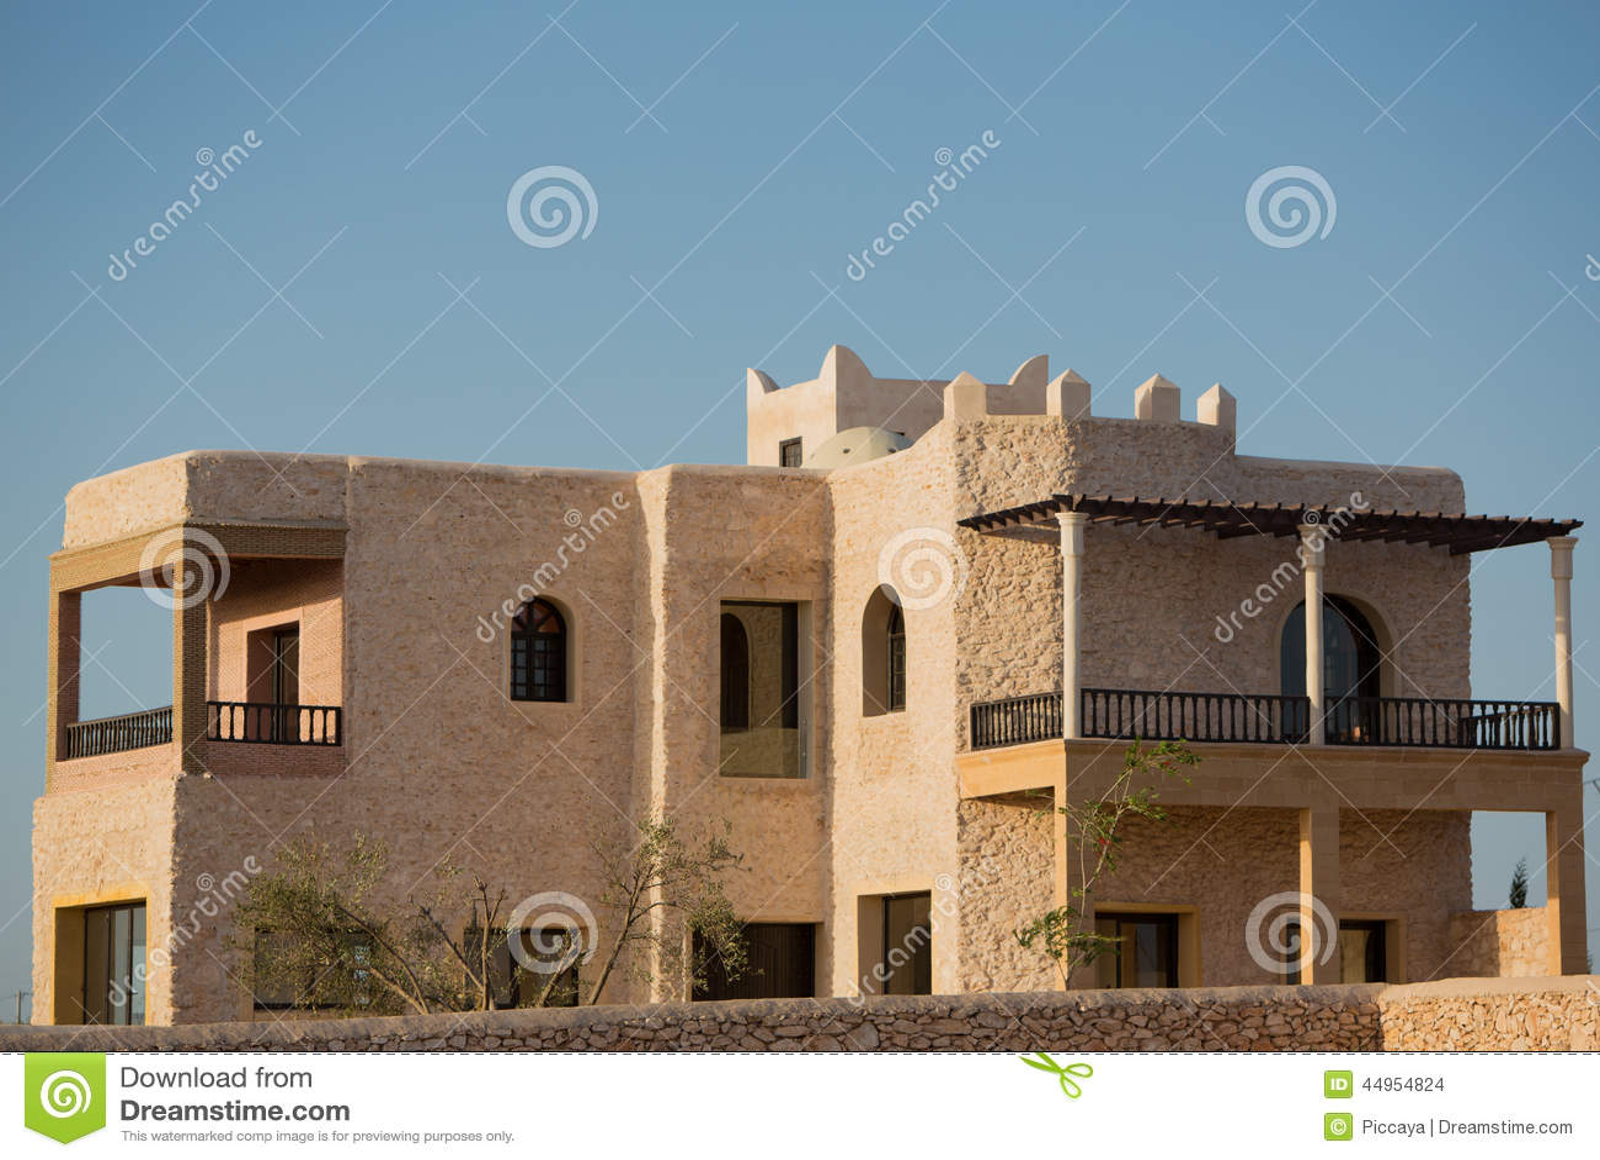 Moderne villa in essaouira bij zonsondergang stock foto beeld 44954824 - Foto moderne villa ...